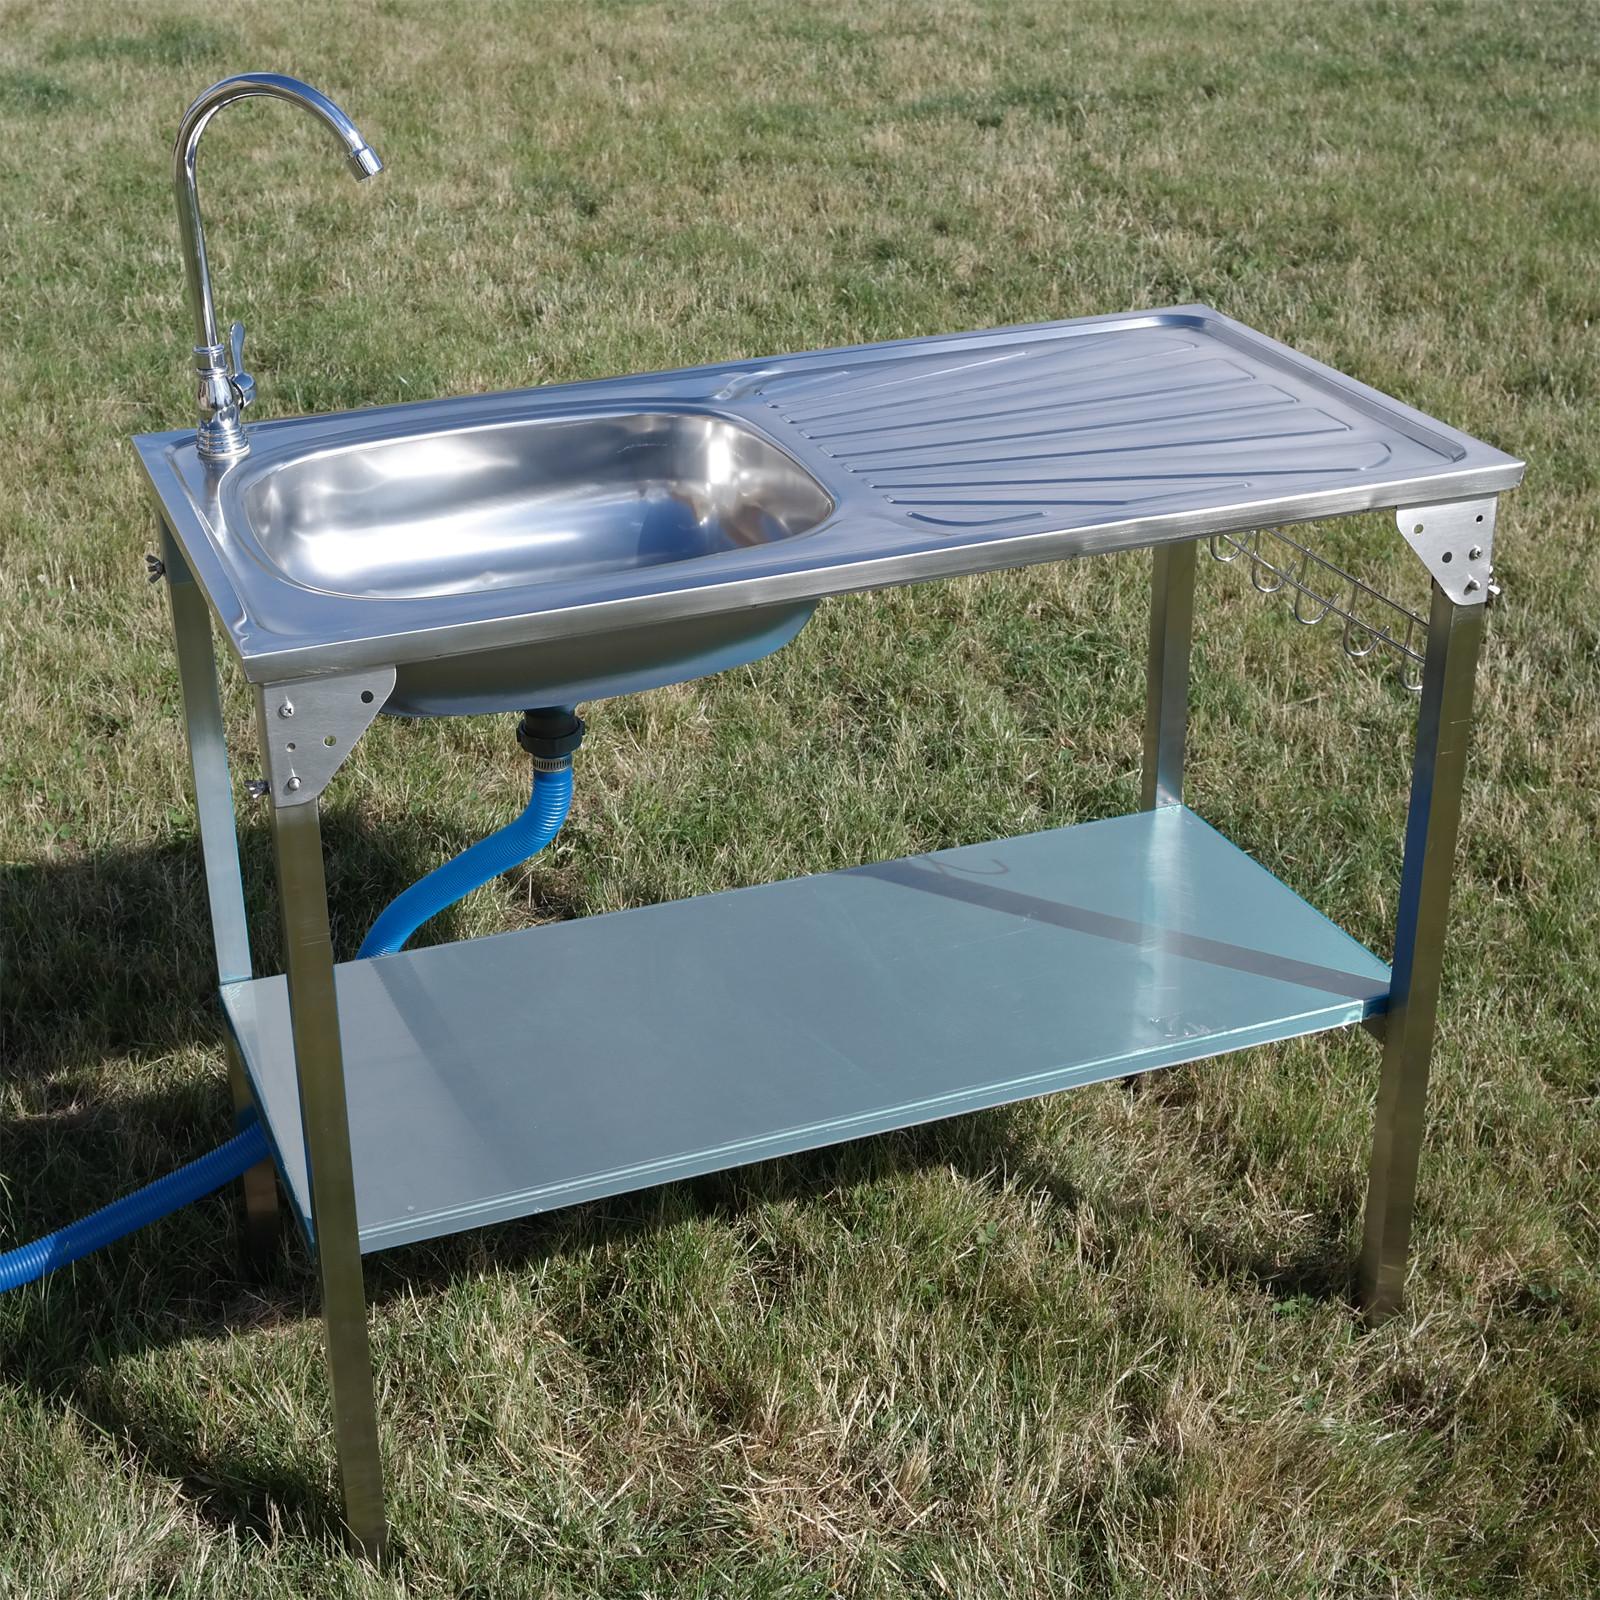 Outdoor Kitchen Sink  CAMPING SINK OUTDOOR KITCHEN STAINLESS STEEL DRAINING